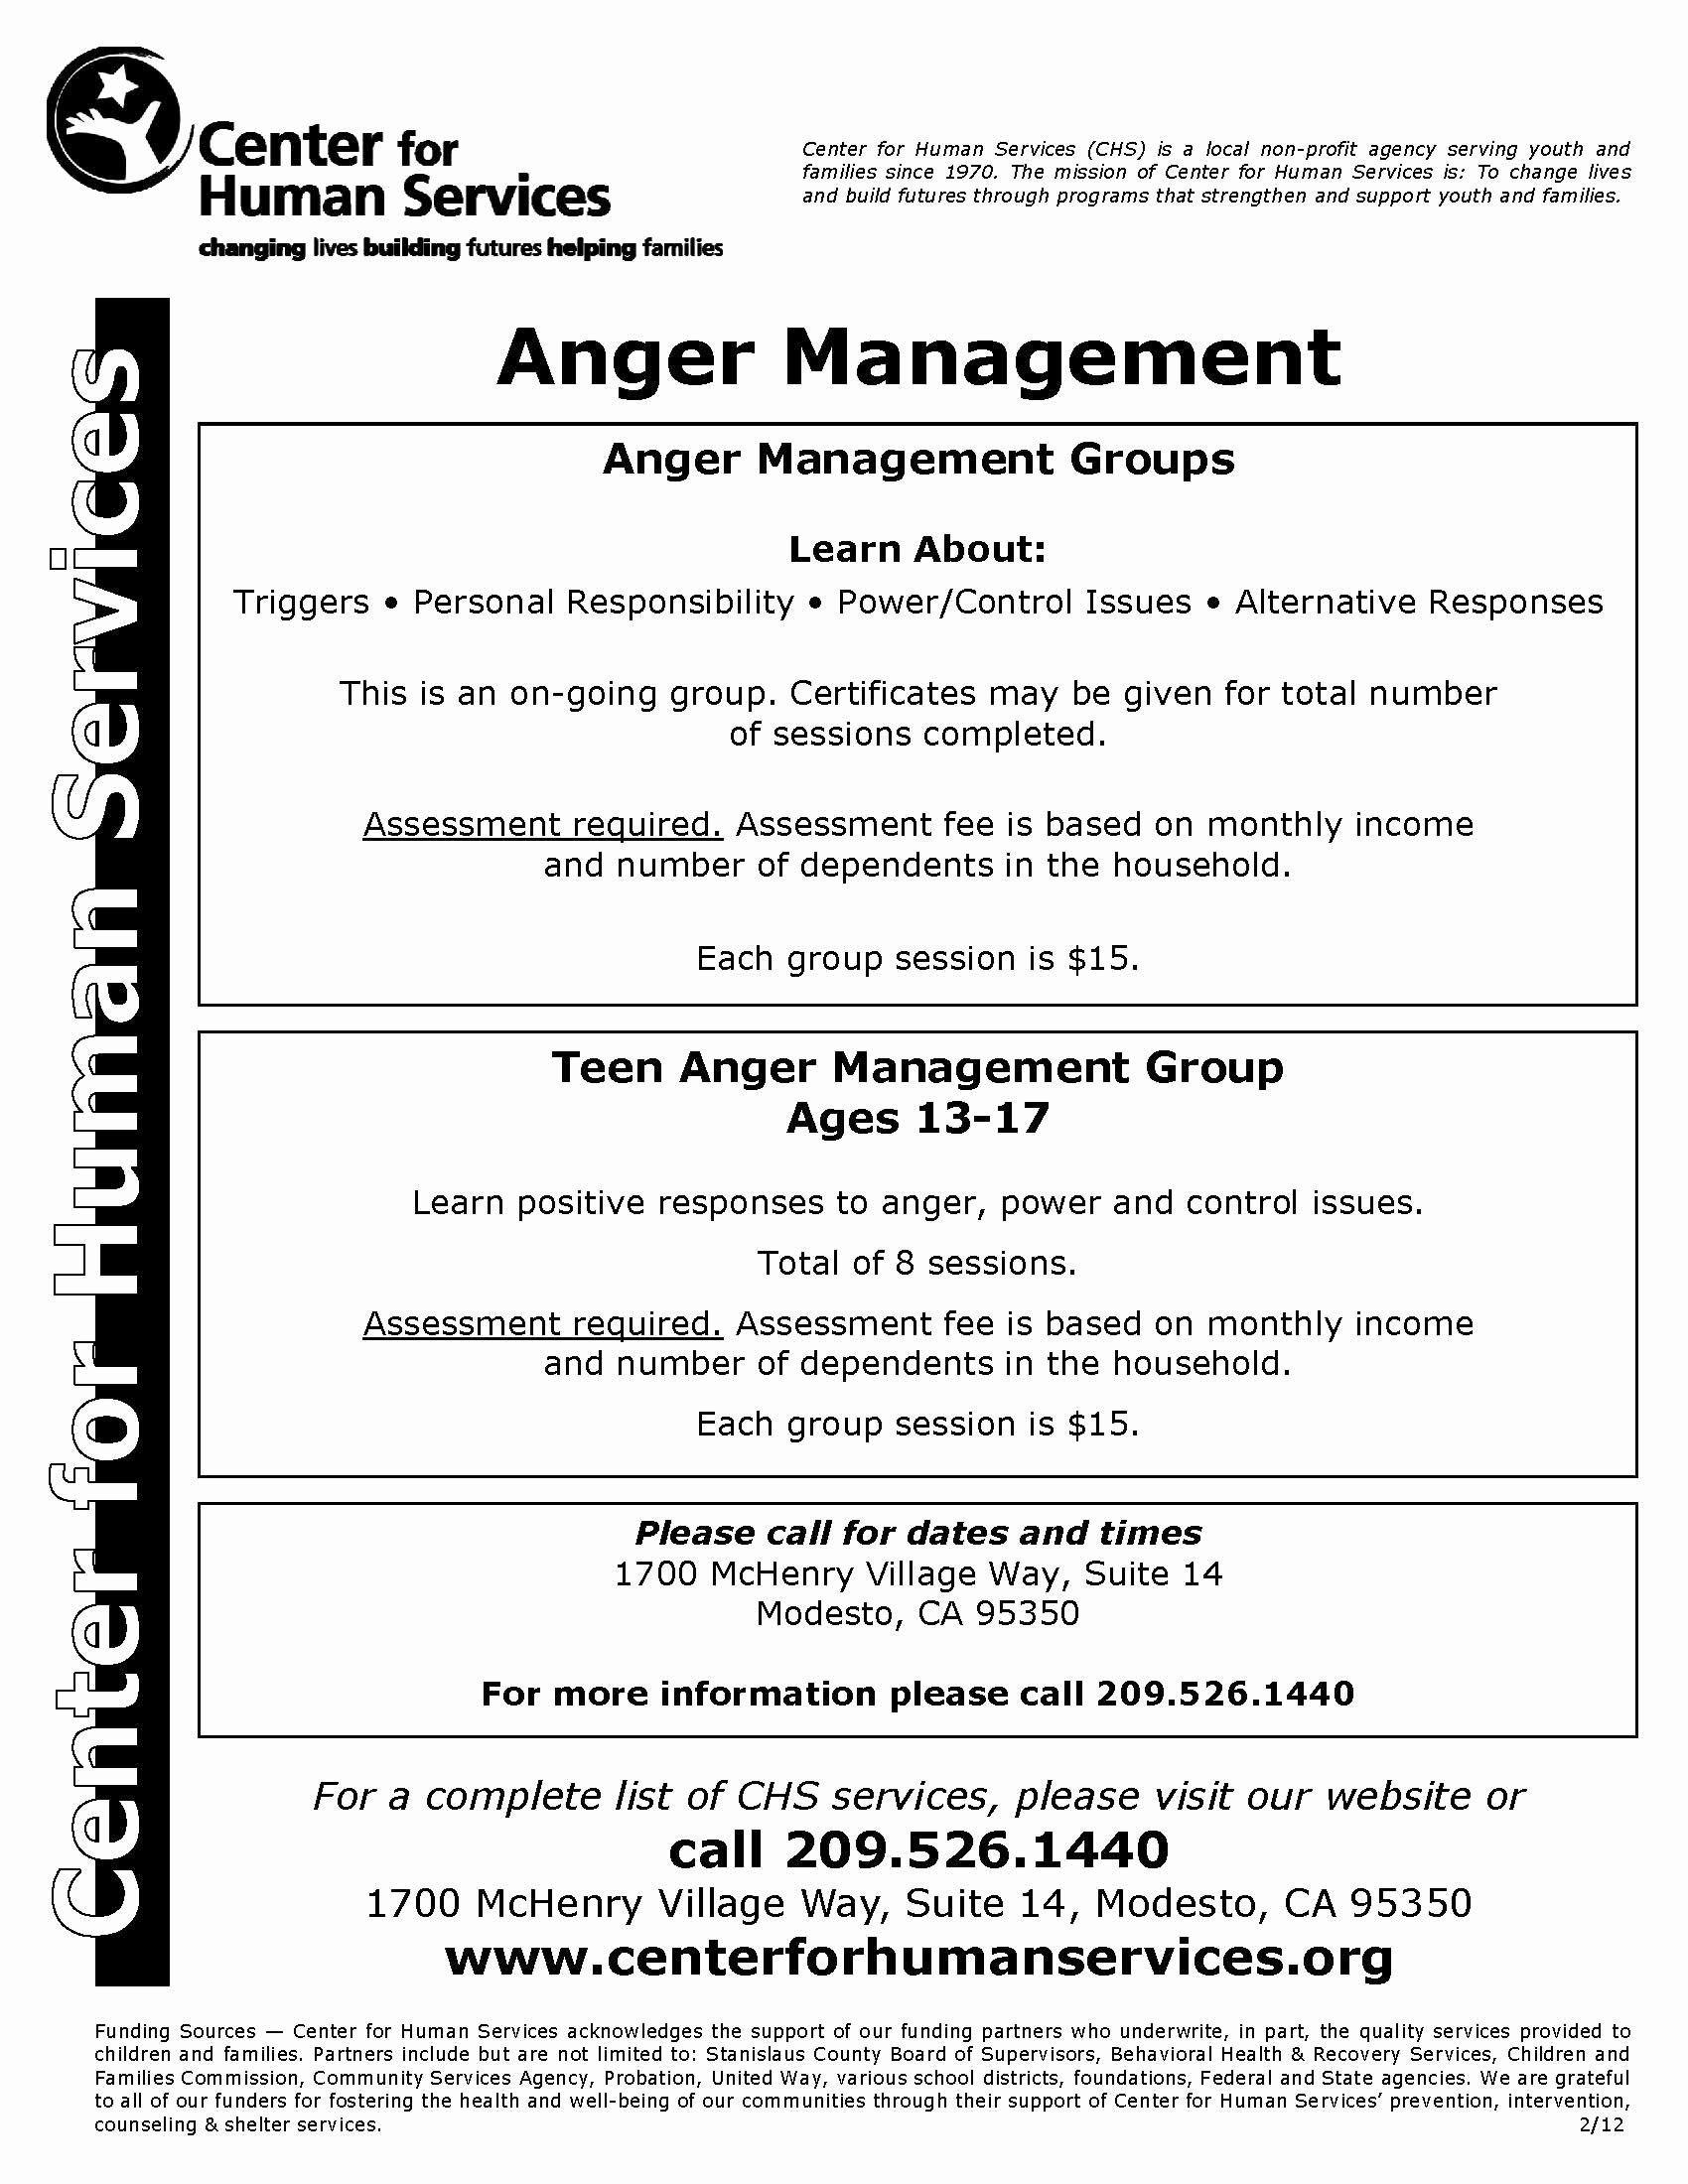 Anger Management Worksheet for Teenagers Anger Management Worksheet for Teens New 19 Best Anger